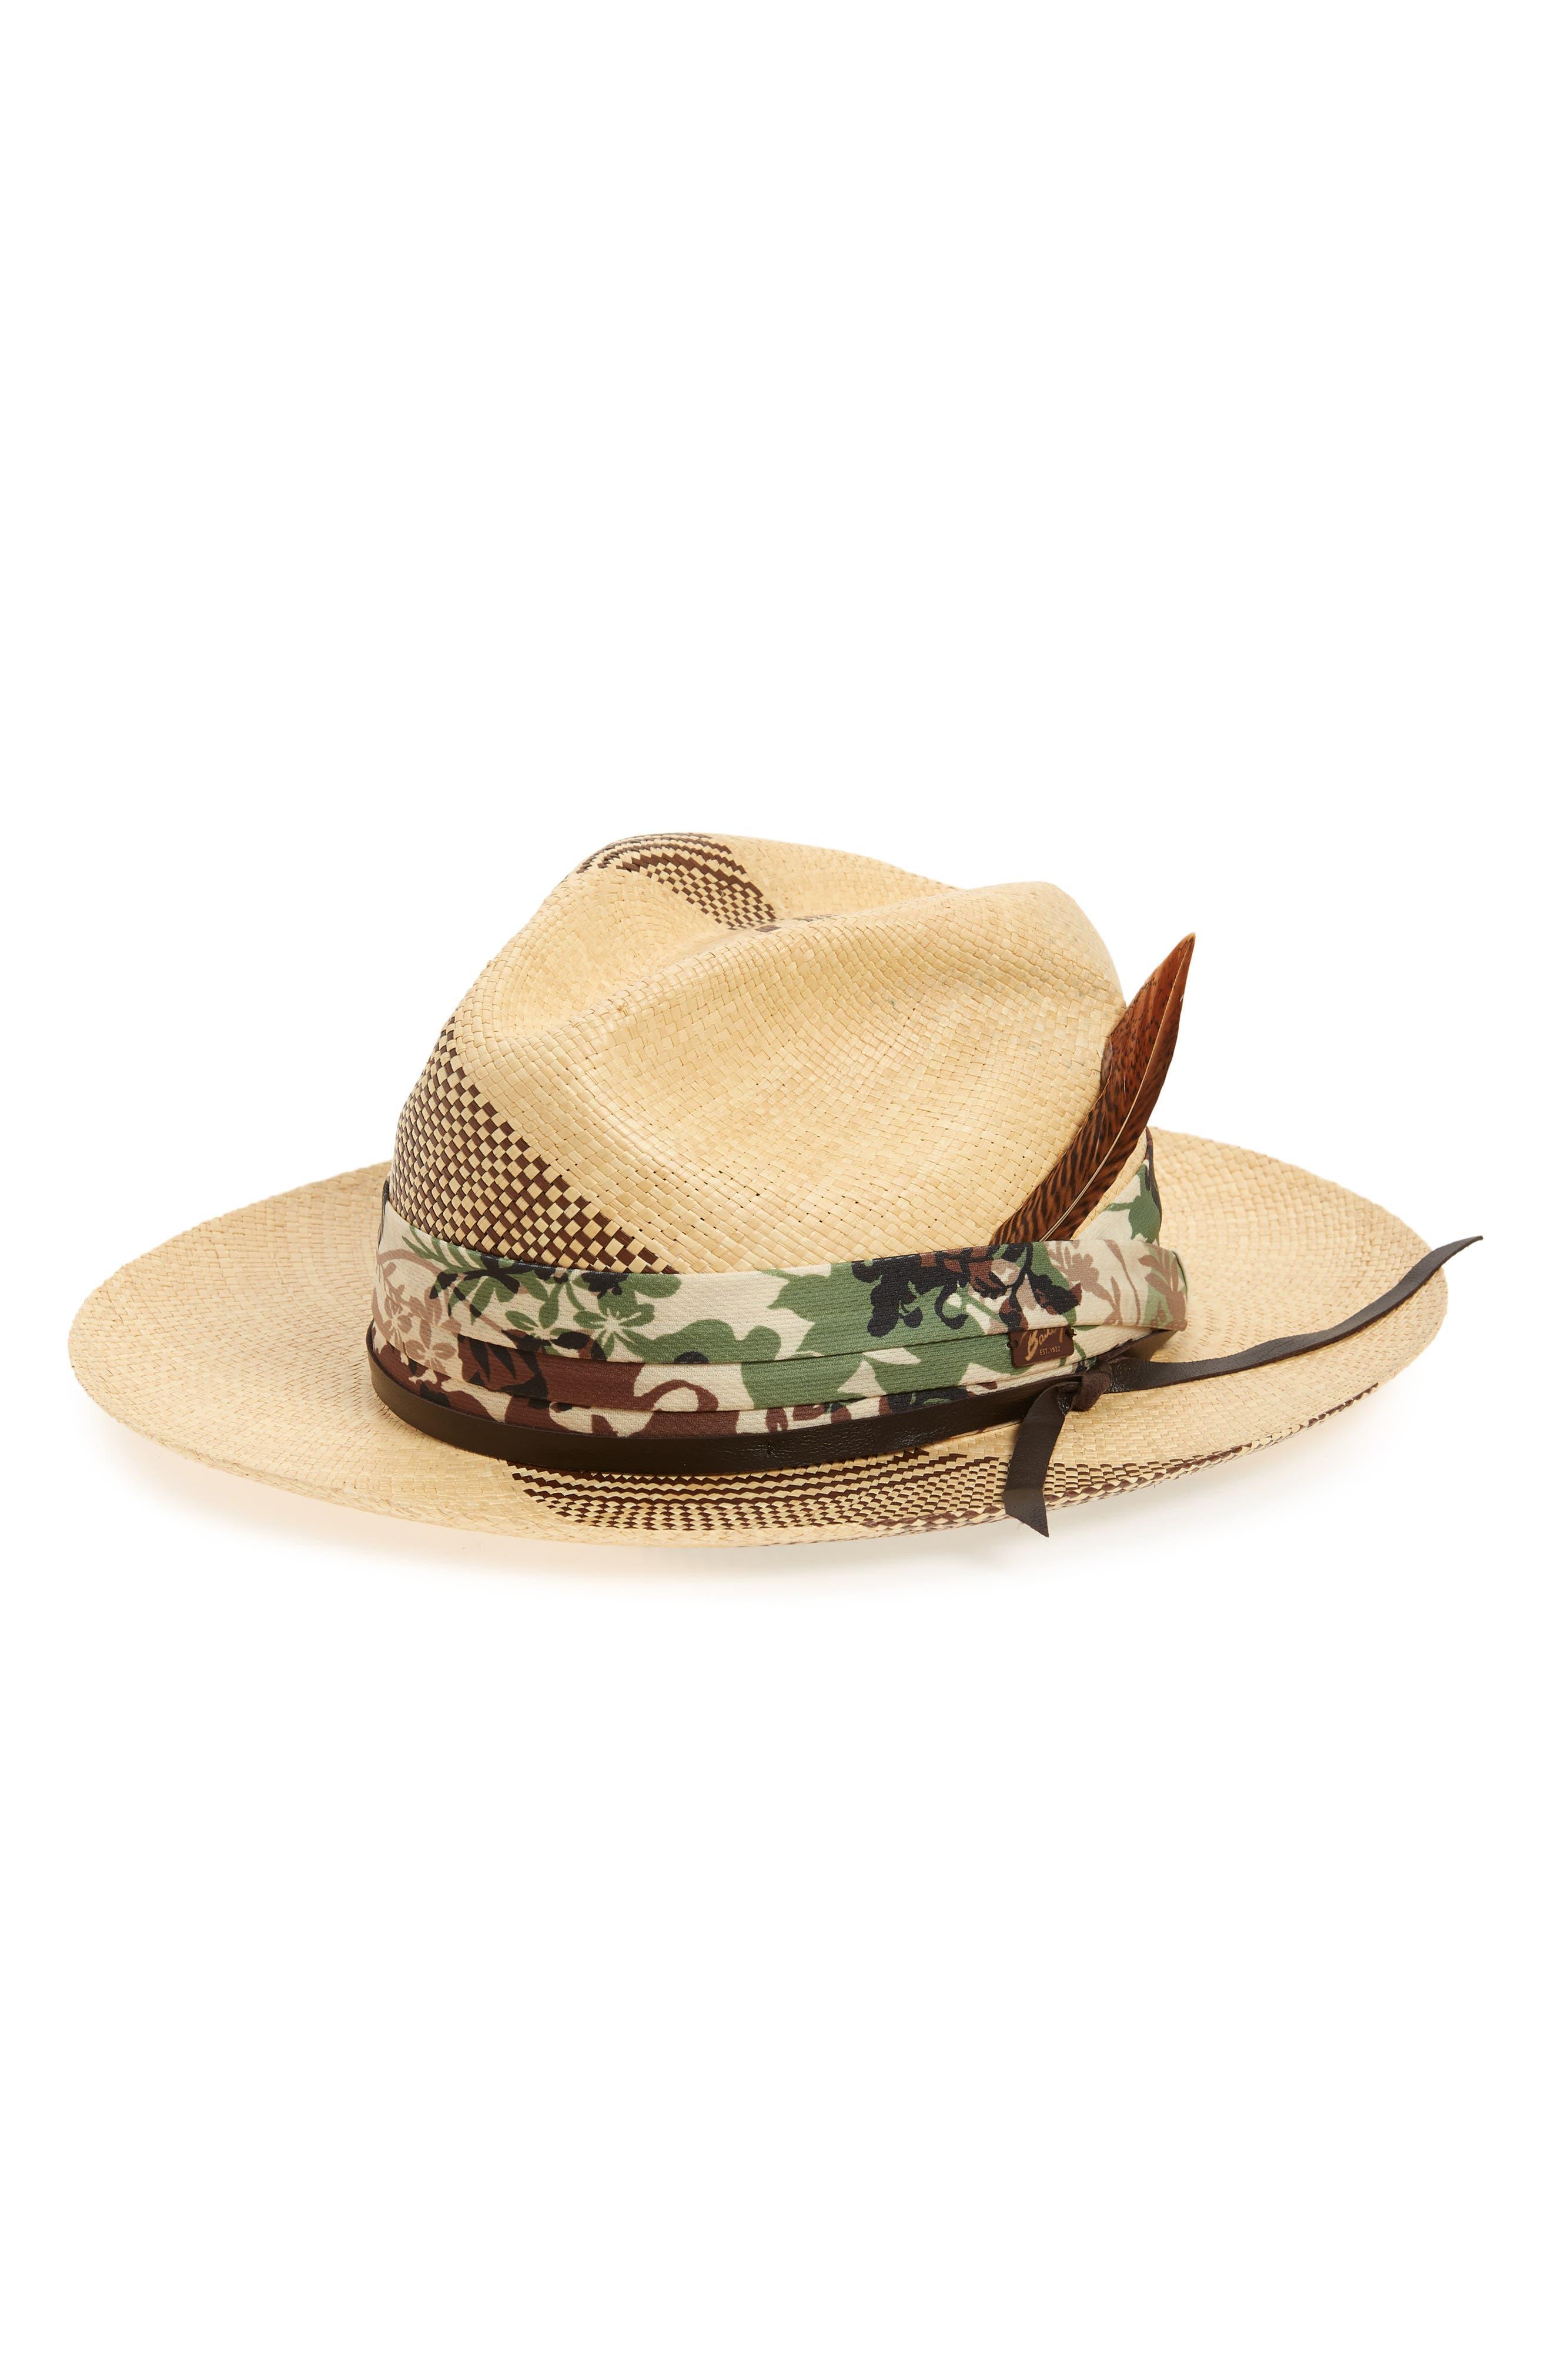 Main Image - Bailey Rayney Straw Panama Hat